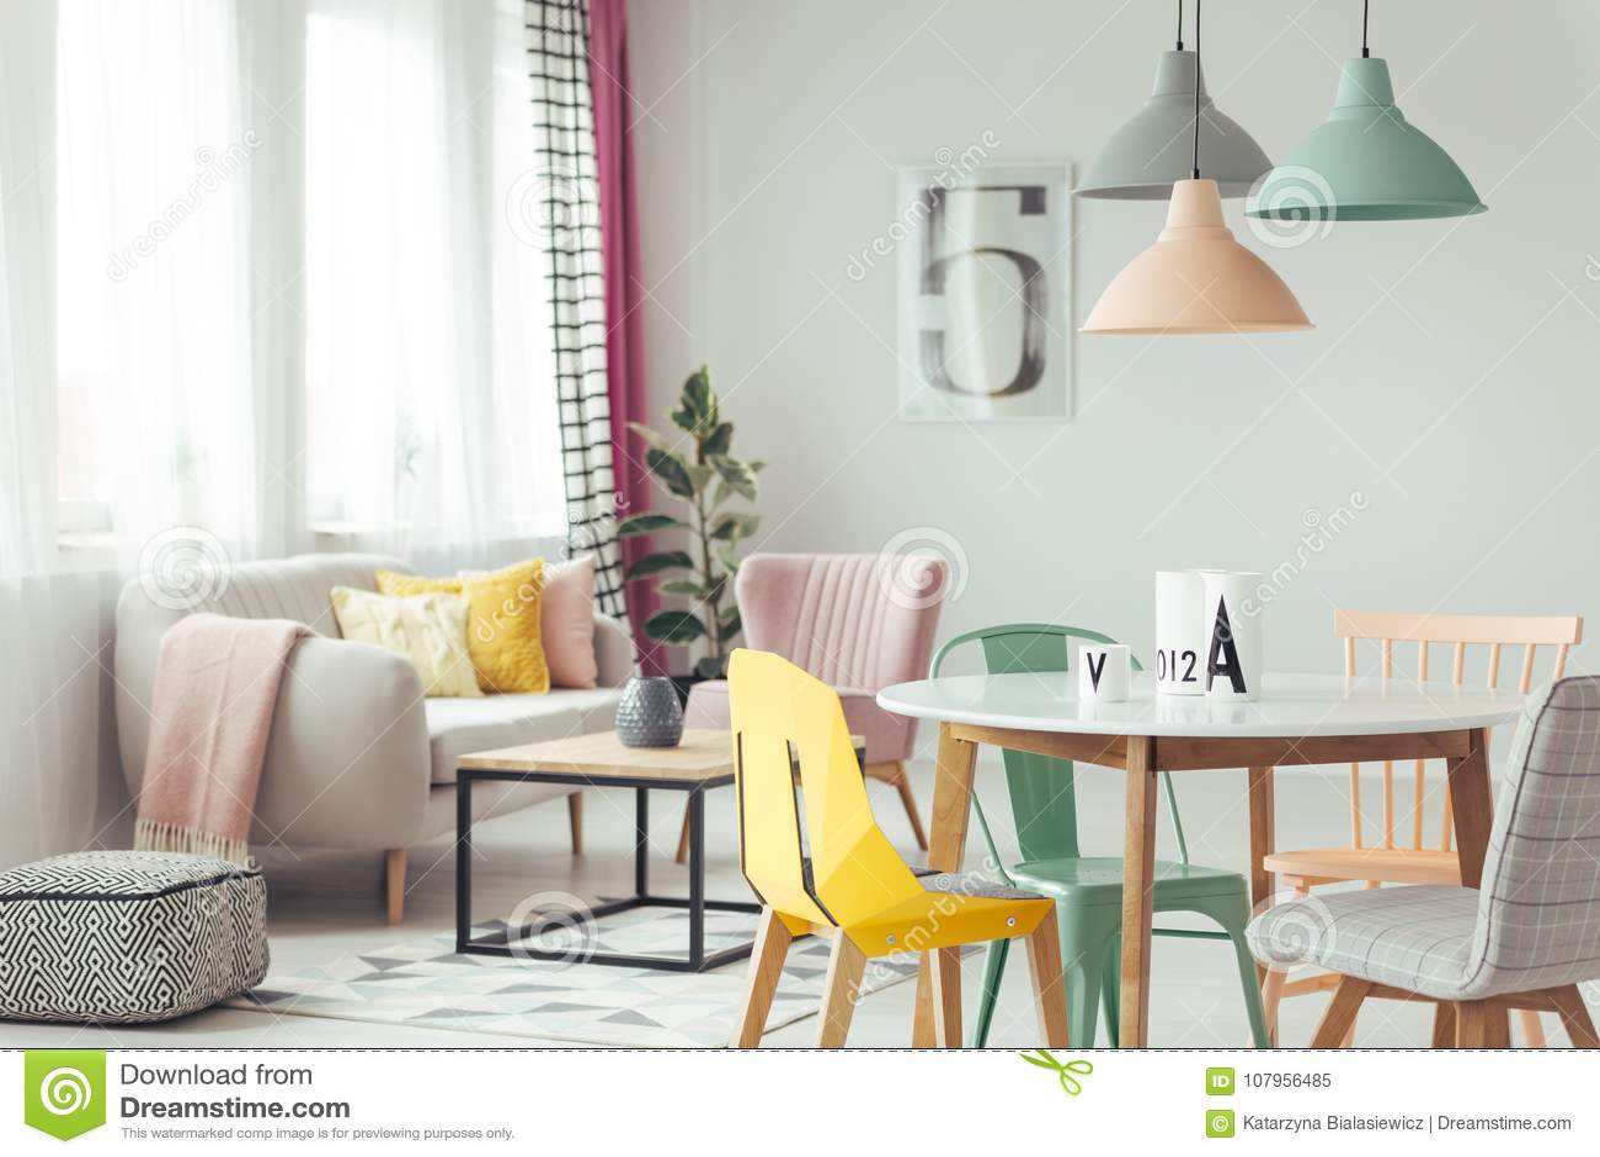 Yellow Bright Living Room Interior Stock Image - Image of modern ...